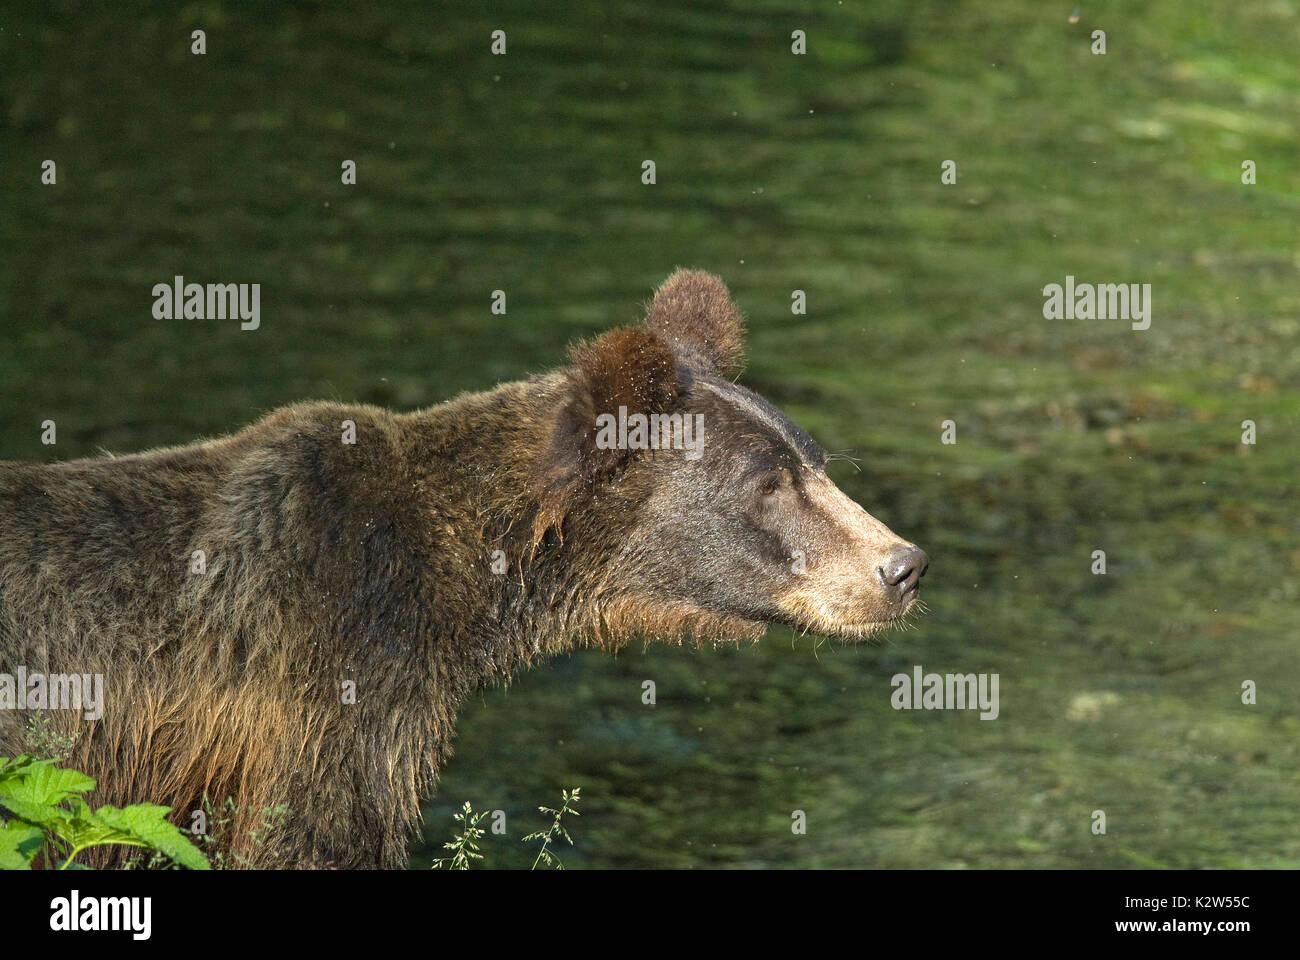 Grizzly  bear (Ursus arctos horribilis), Fish creek, Tongass National Forest, Hyder, Alaska, USA, North America - Stock Image